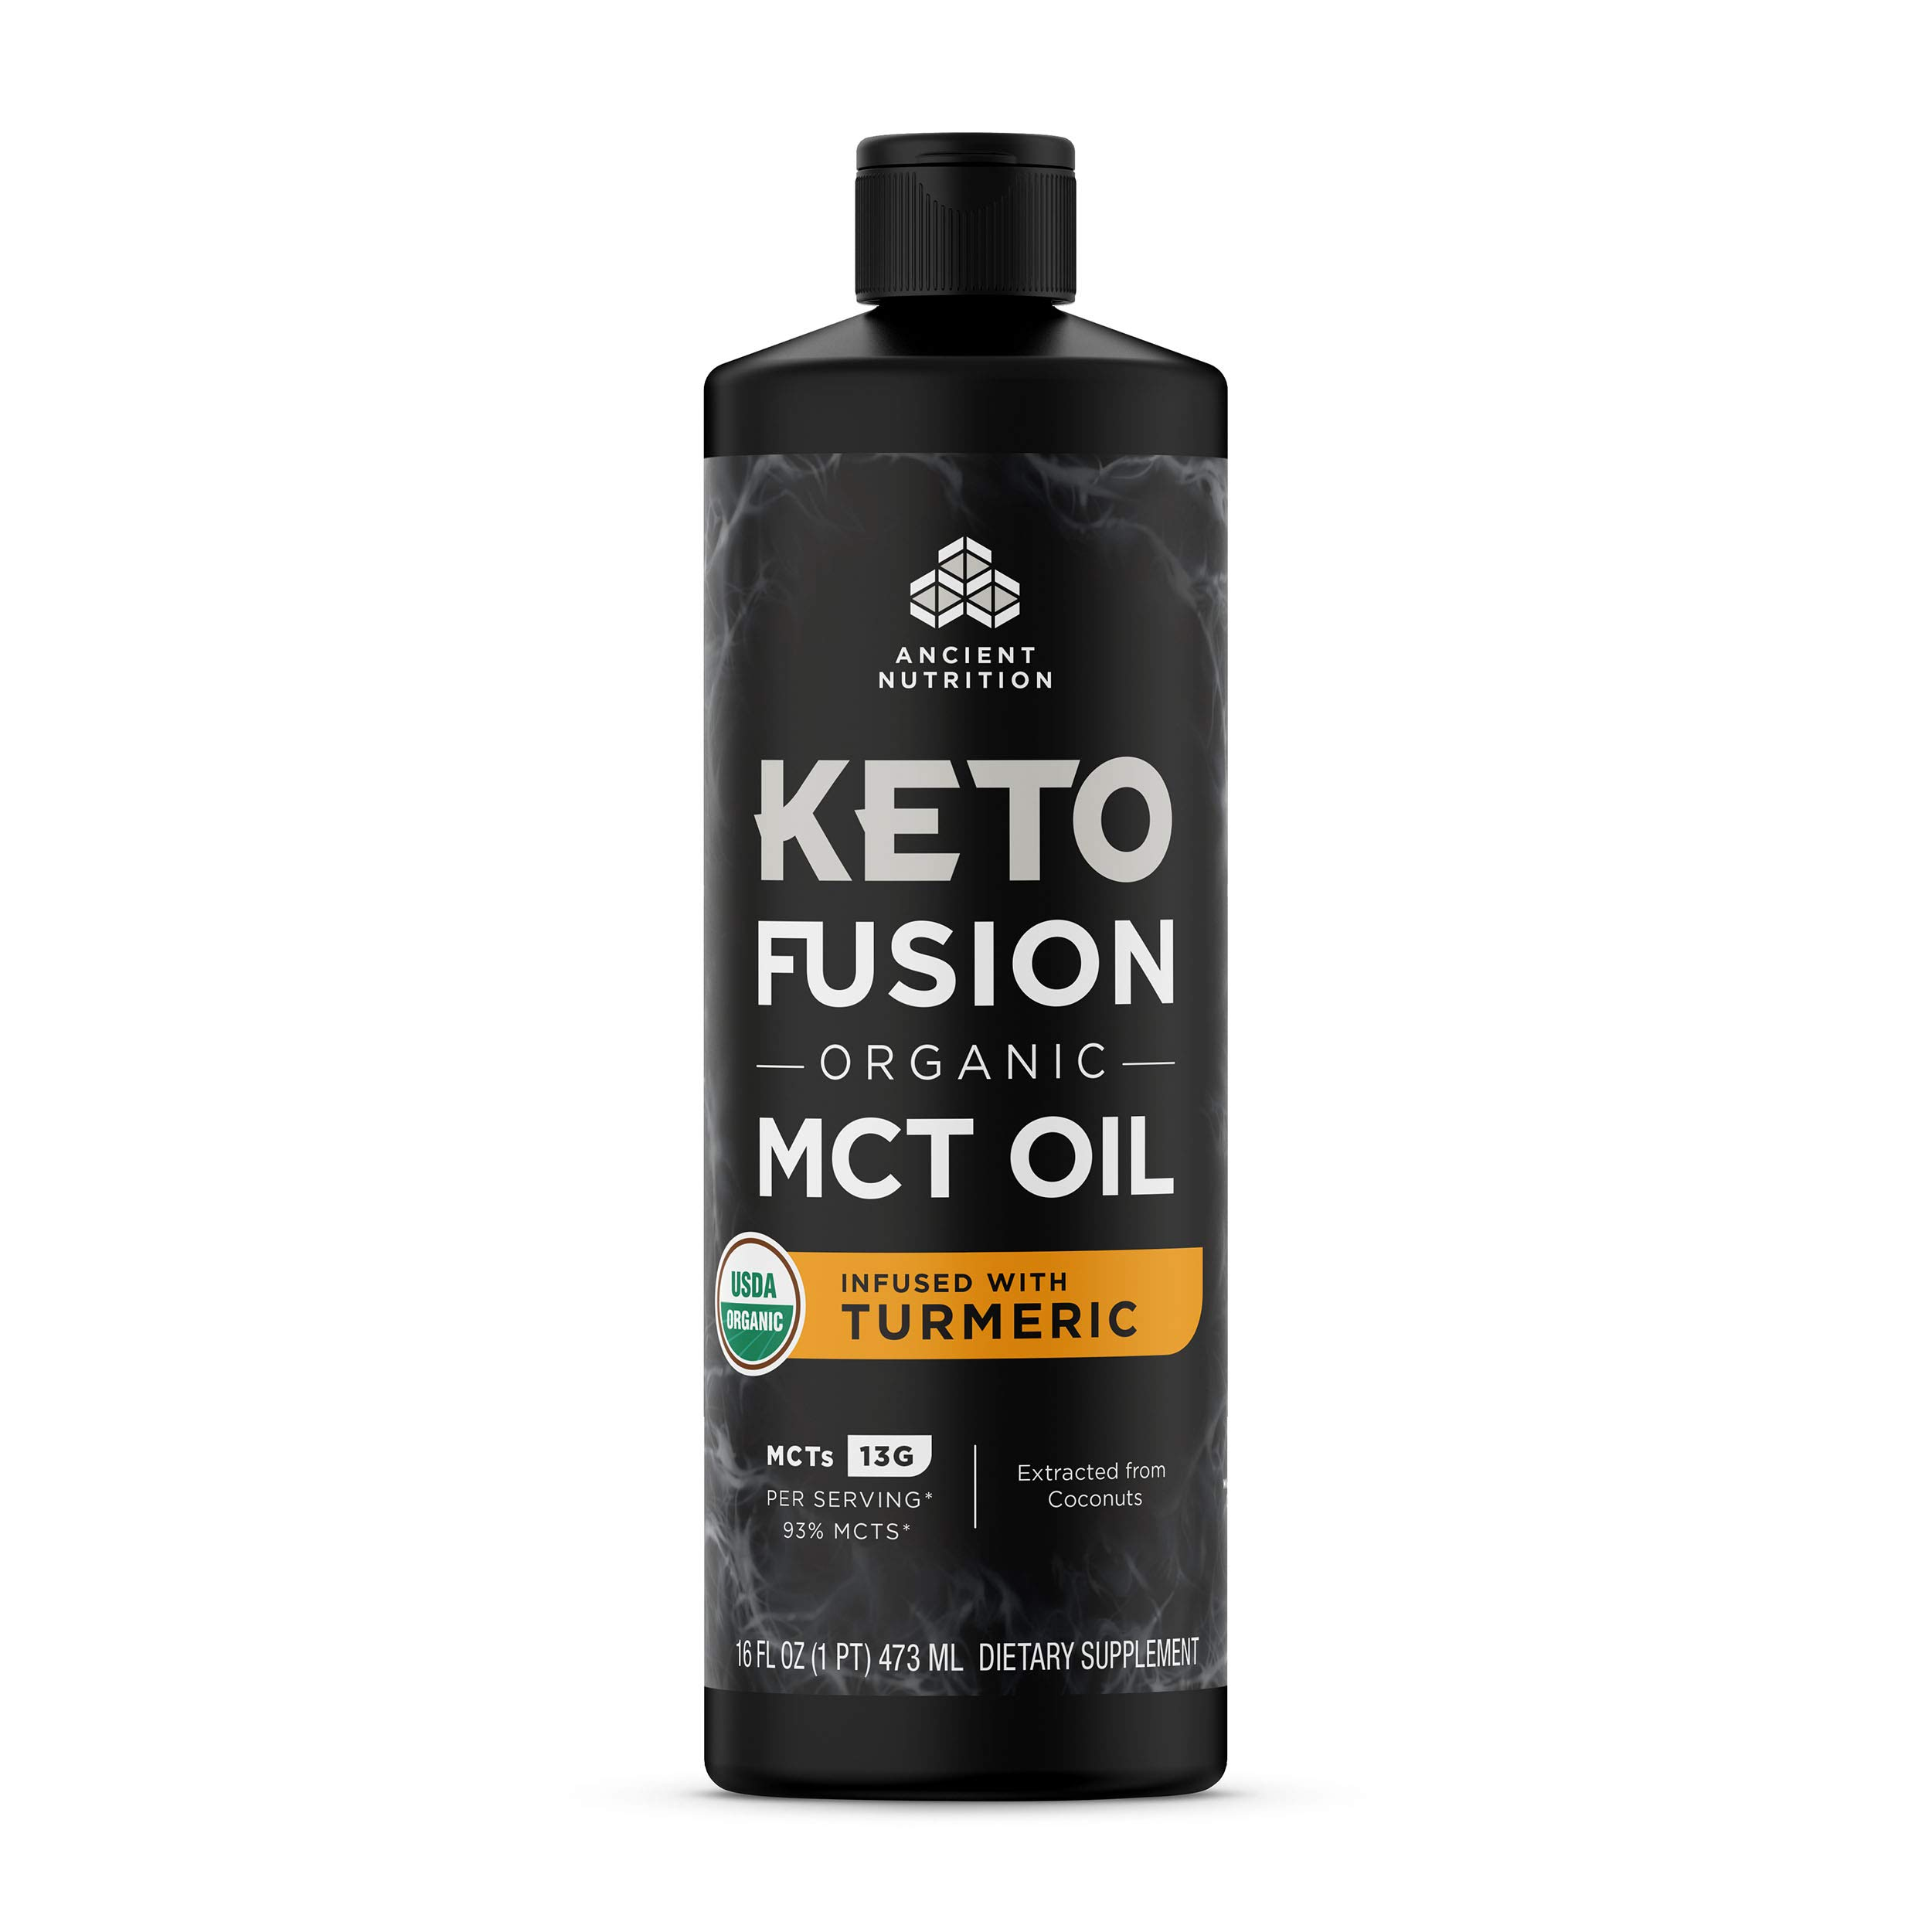 KetoFUSION MCT Oil Turmeric Flavor, MCTs from Coconut, Certified USDA Organic, Organic Turmeric, 16 oz…